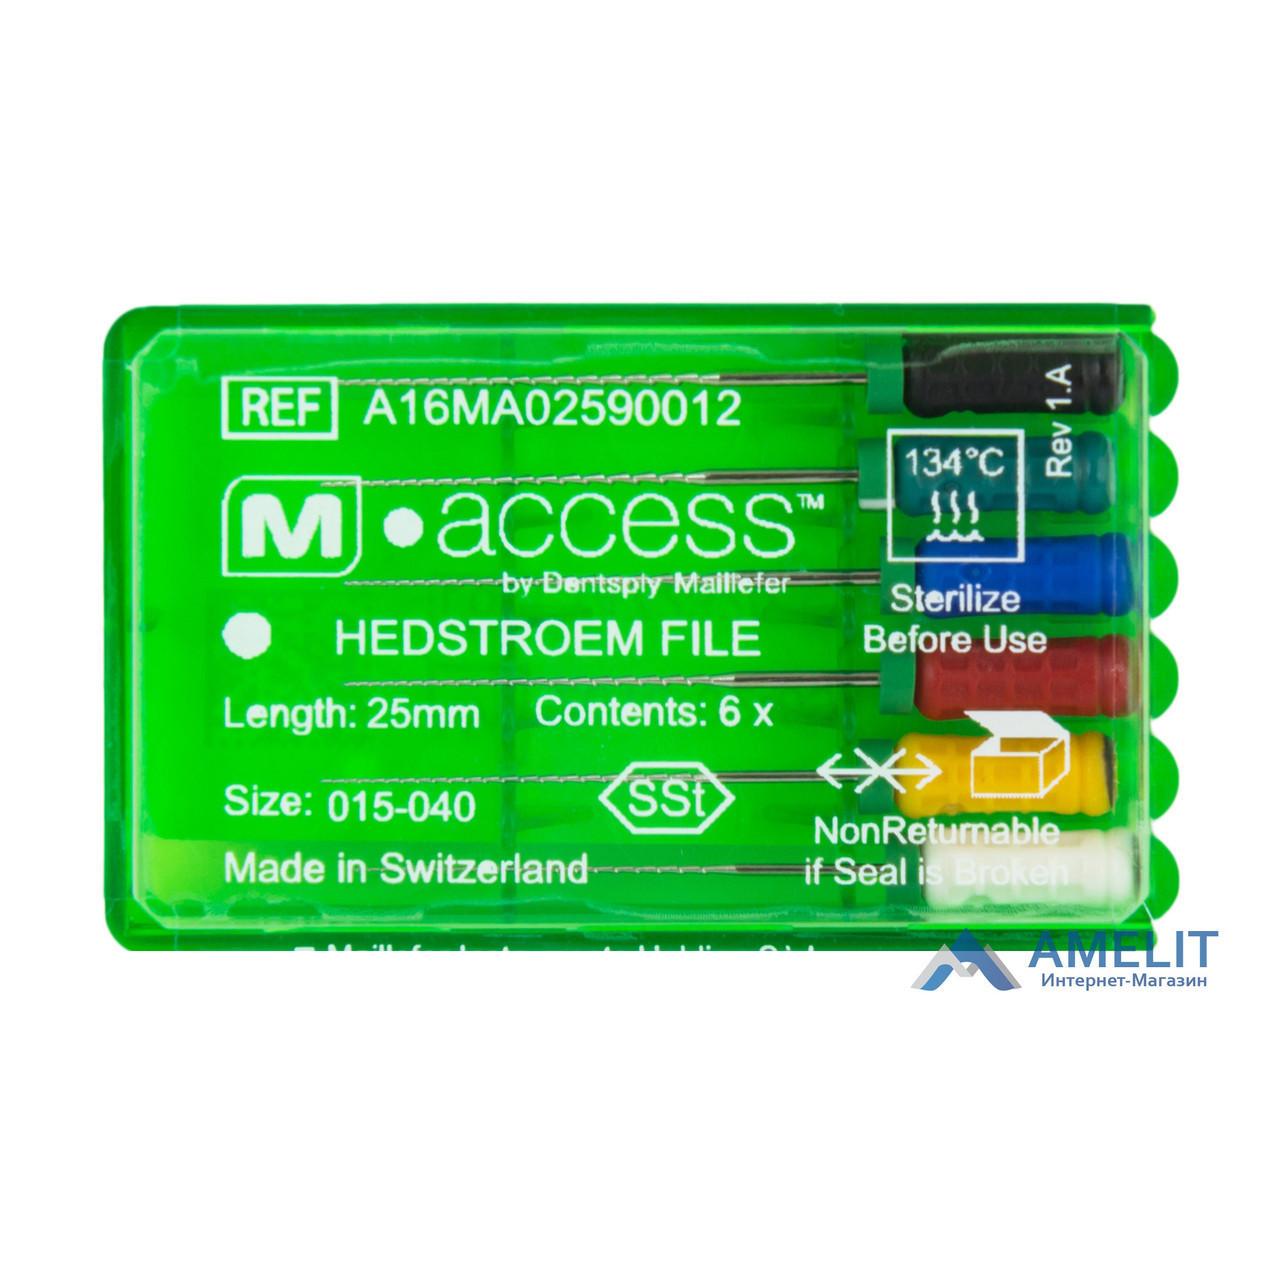 Н-файл M-Access №25(H-File M-Access,Dentsply Maillefer), 6 шт. /уп.